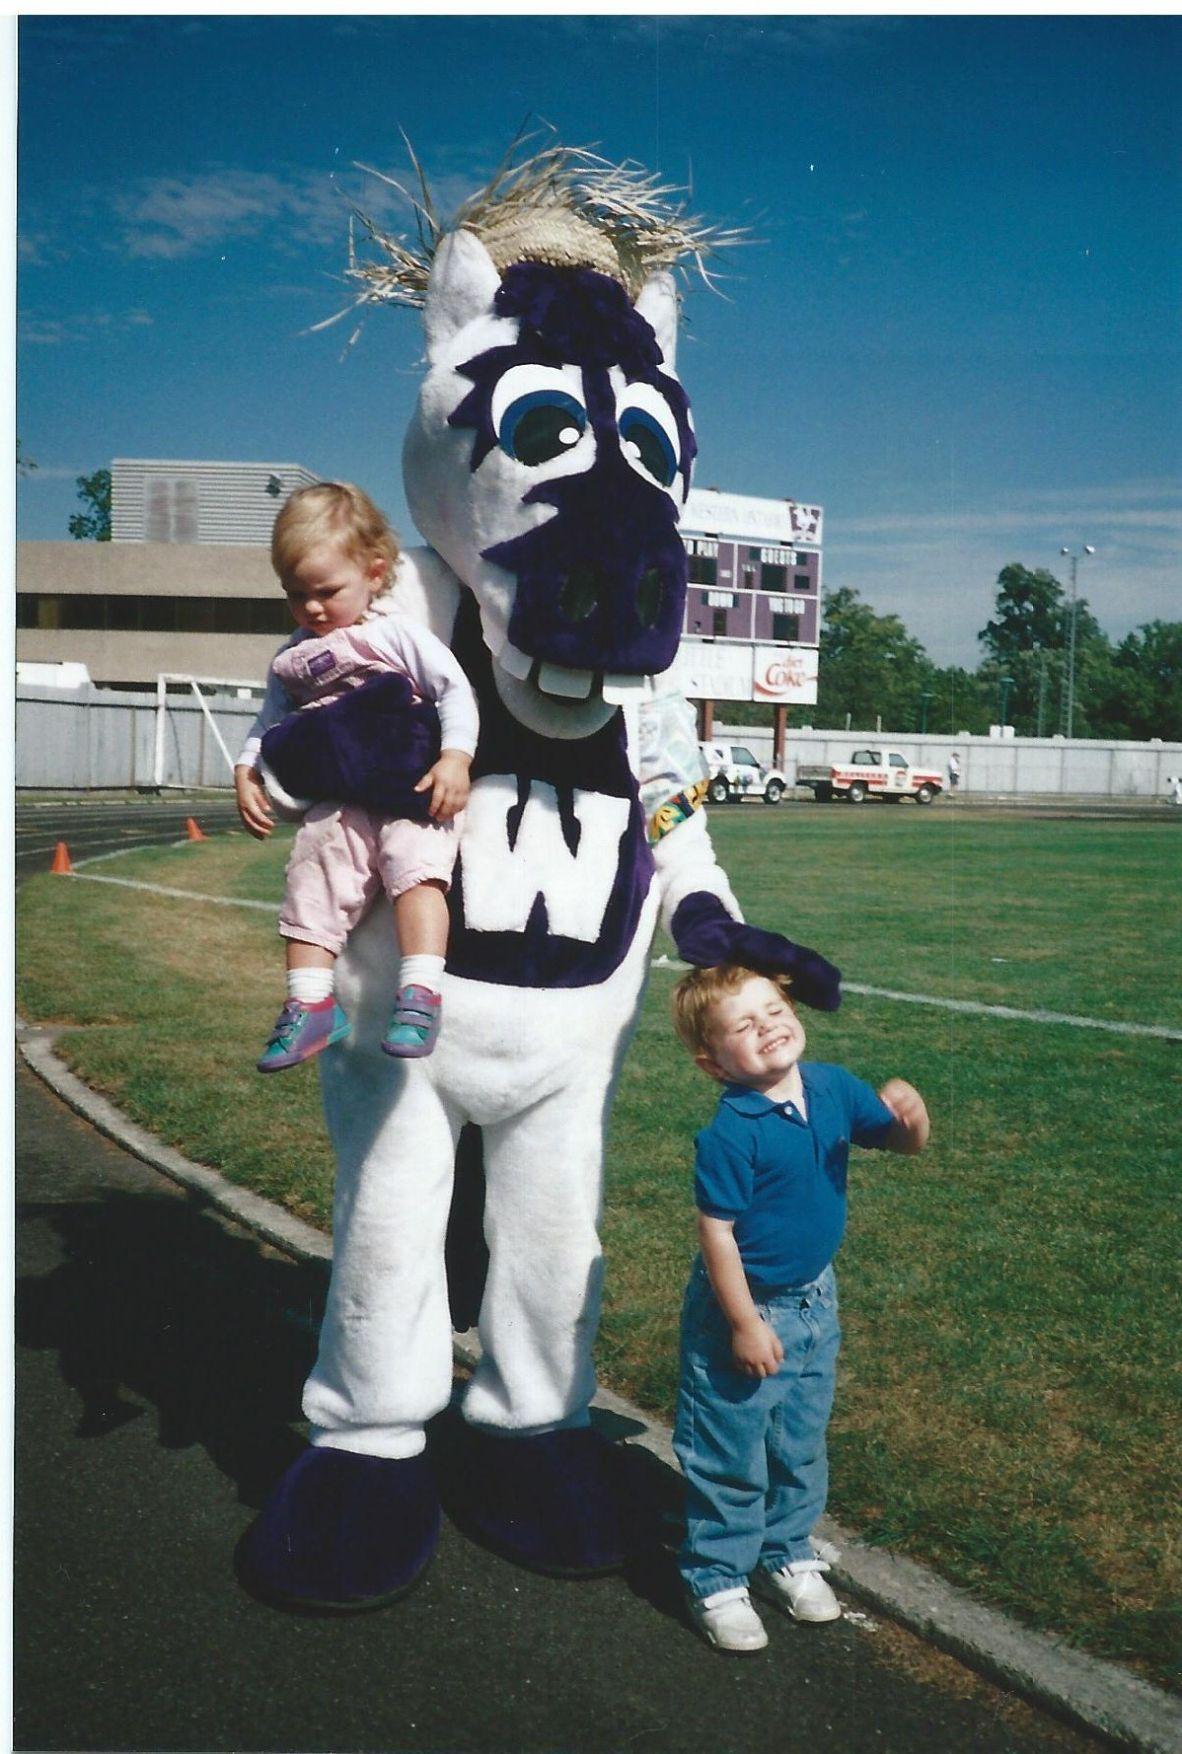 JW Mustang Bone family